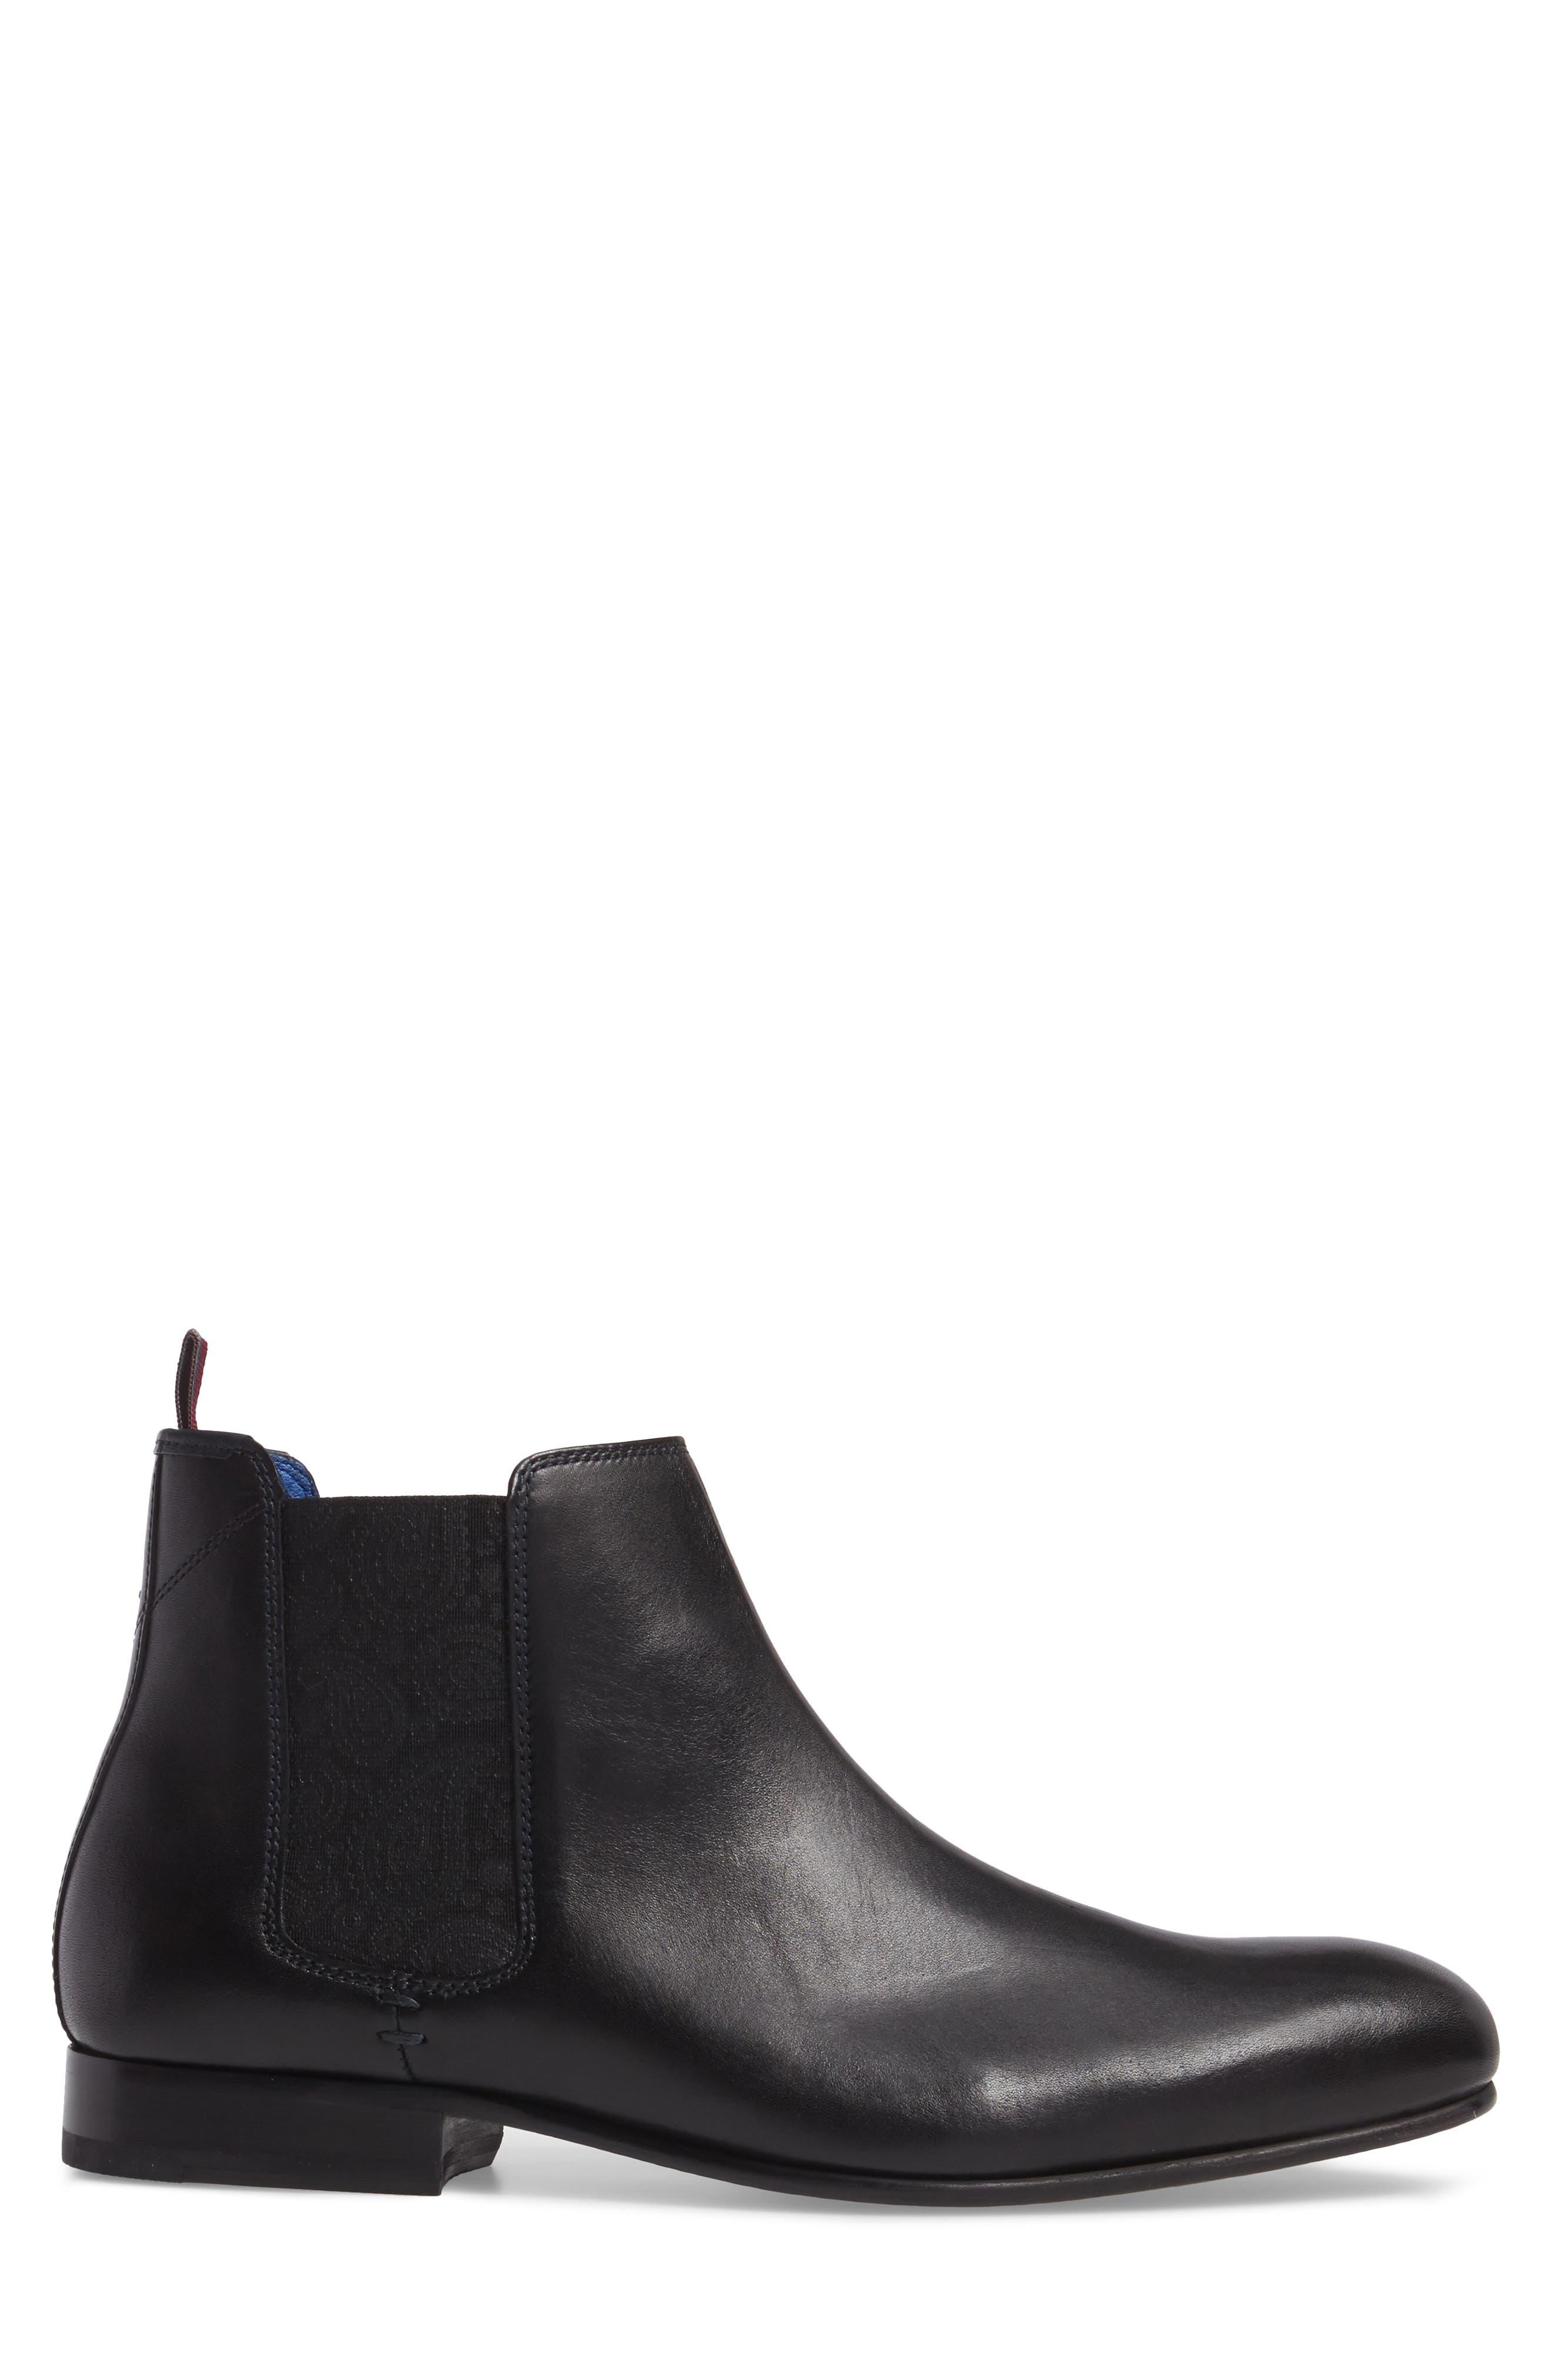 Kayto Chelsea Boot,                             Alternate thumbnail 3, color,                             Black Leather